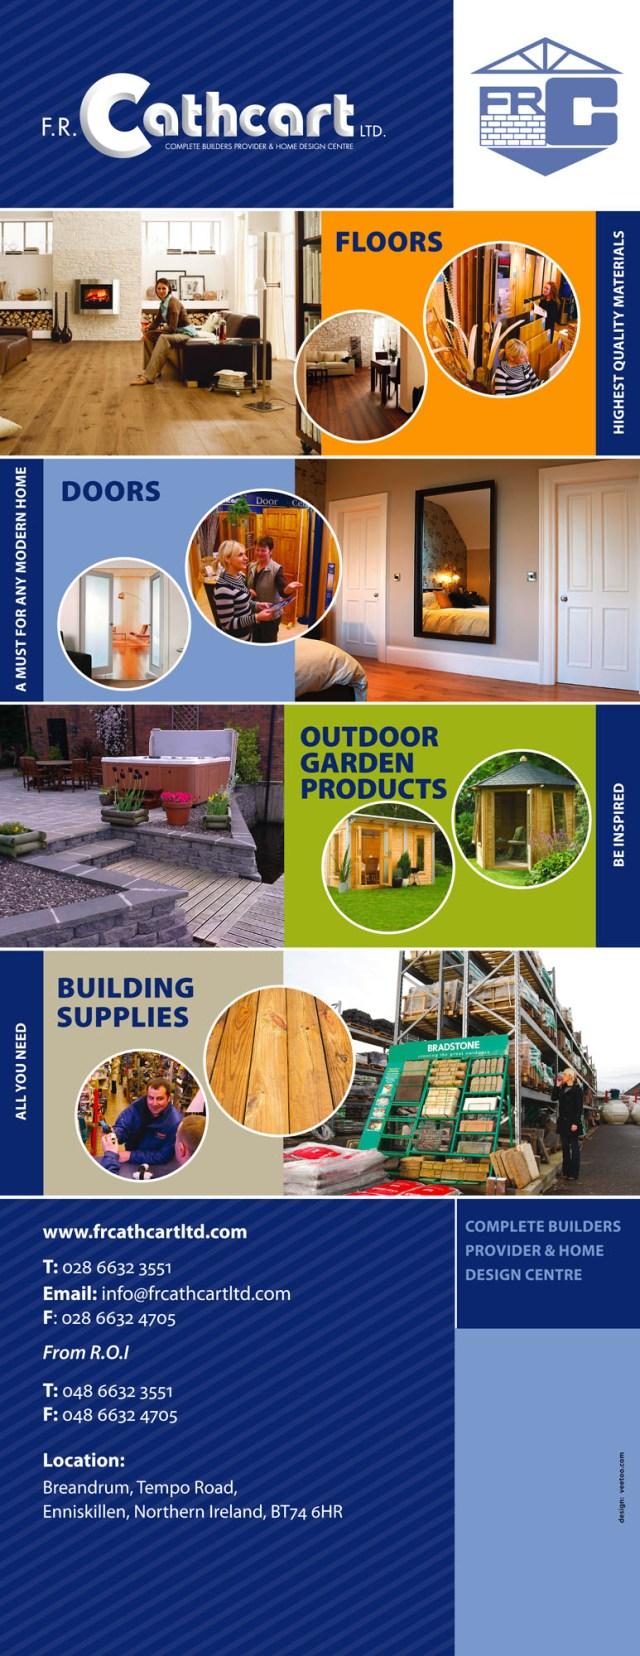 beautiful home design nahfa pictures house interior design